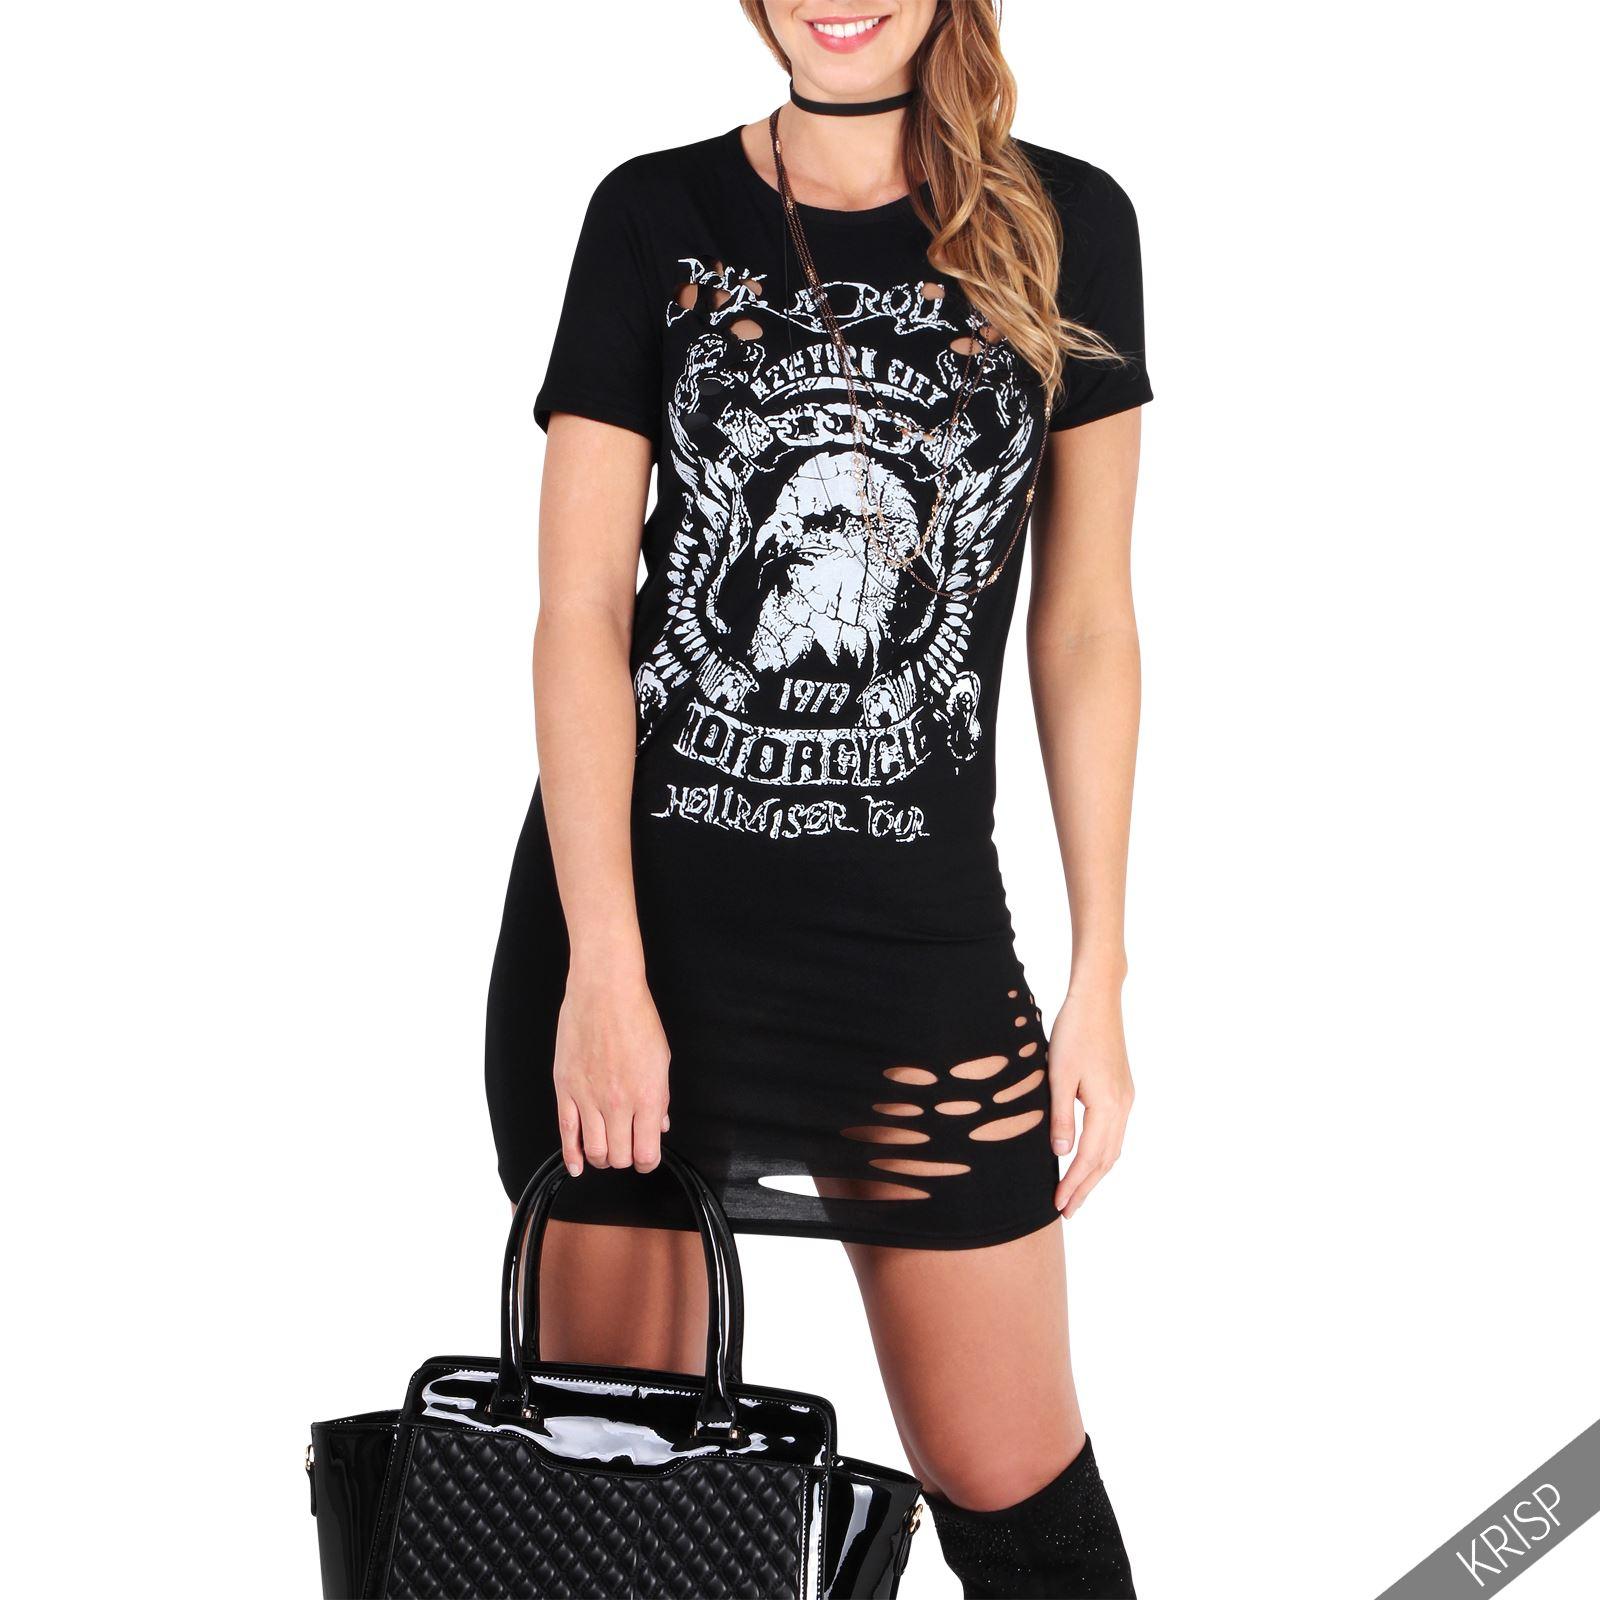 damen gerissenes kurzarm longshirt sommer oberteil party shirt cut out kleid ebay. Black Bedroom Furniture Sets. Home Design Ideas